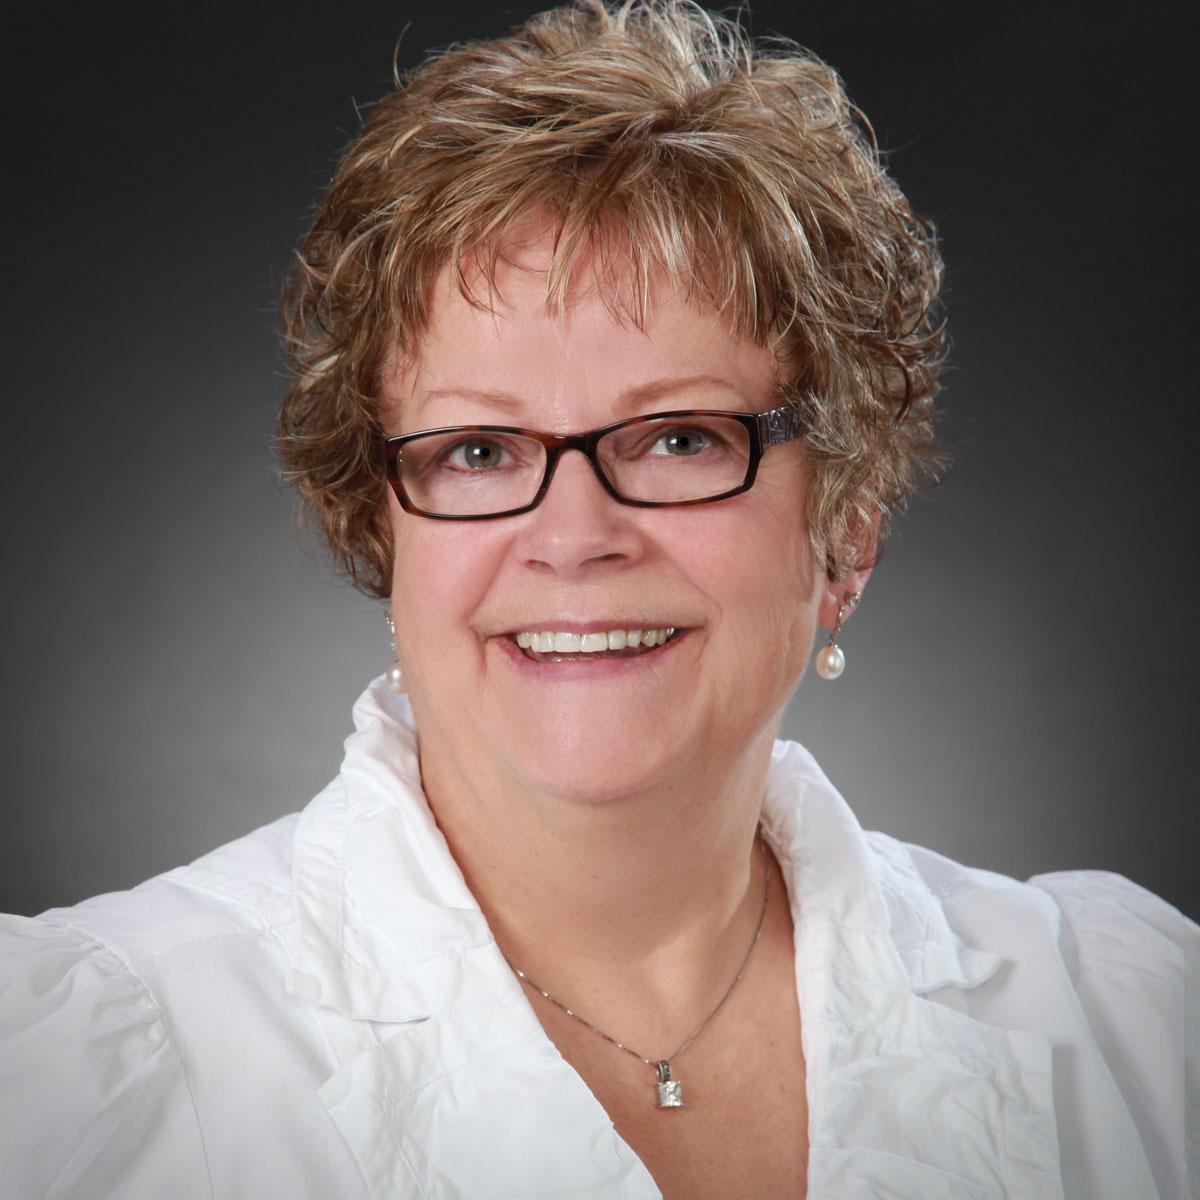 Pam Kaupins